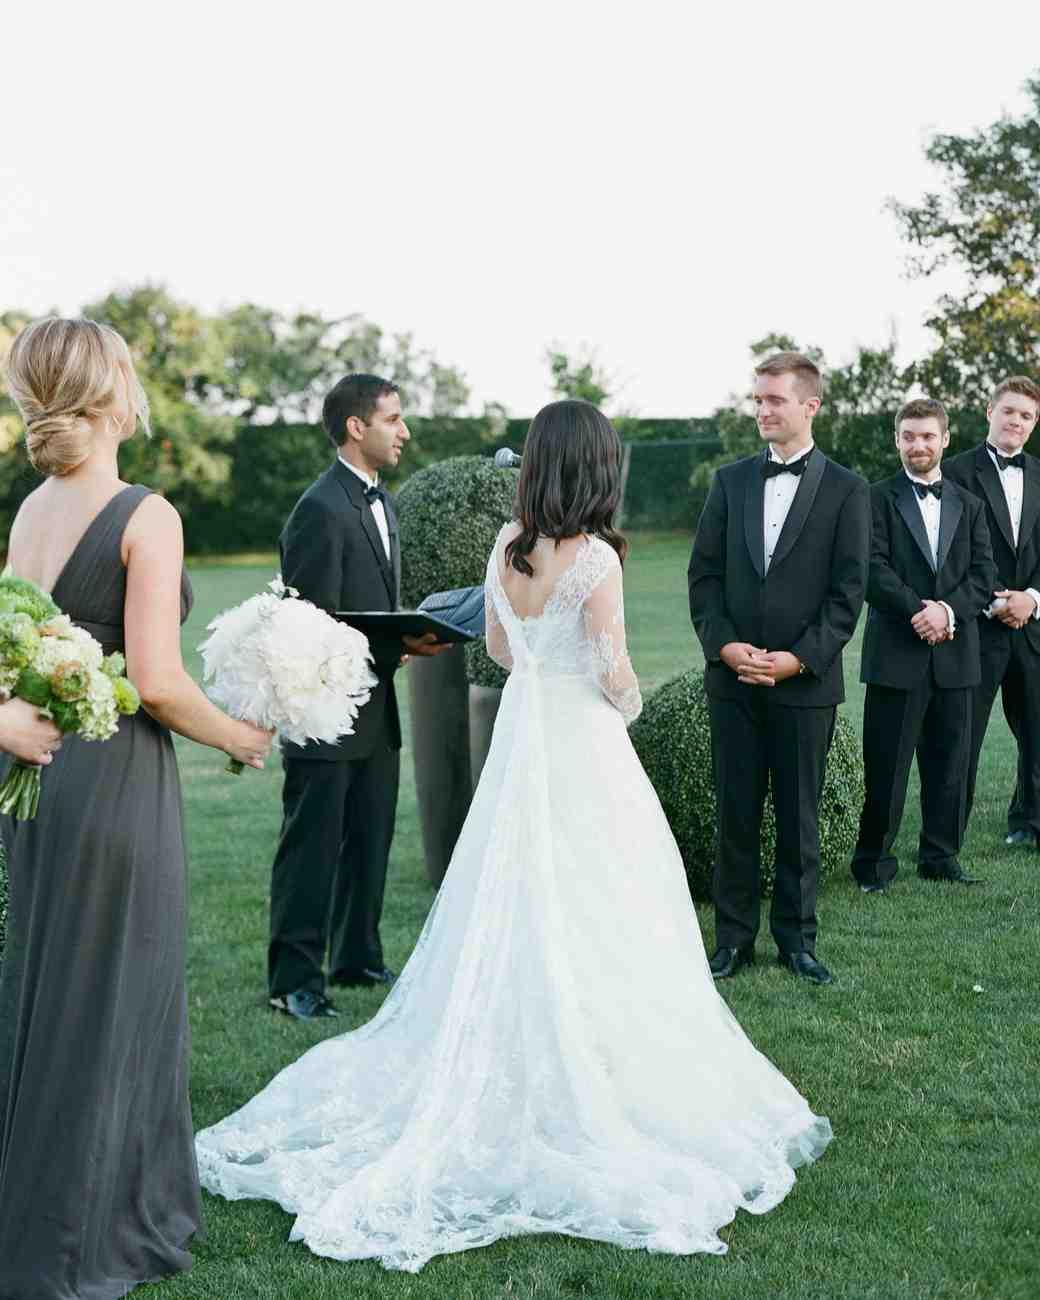 lissy-steven-wedding-newport-ceremony-42-elizabethmessina-s112907-0516.jpg